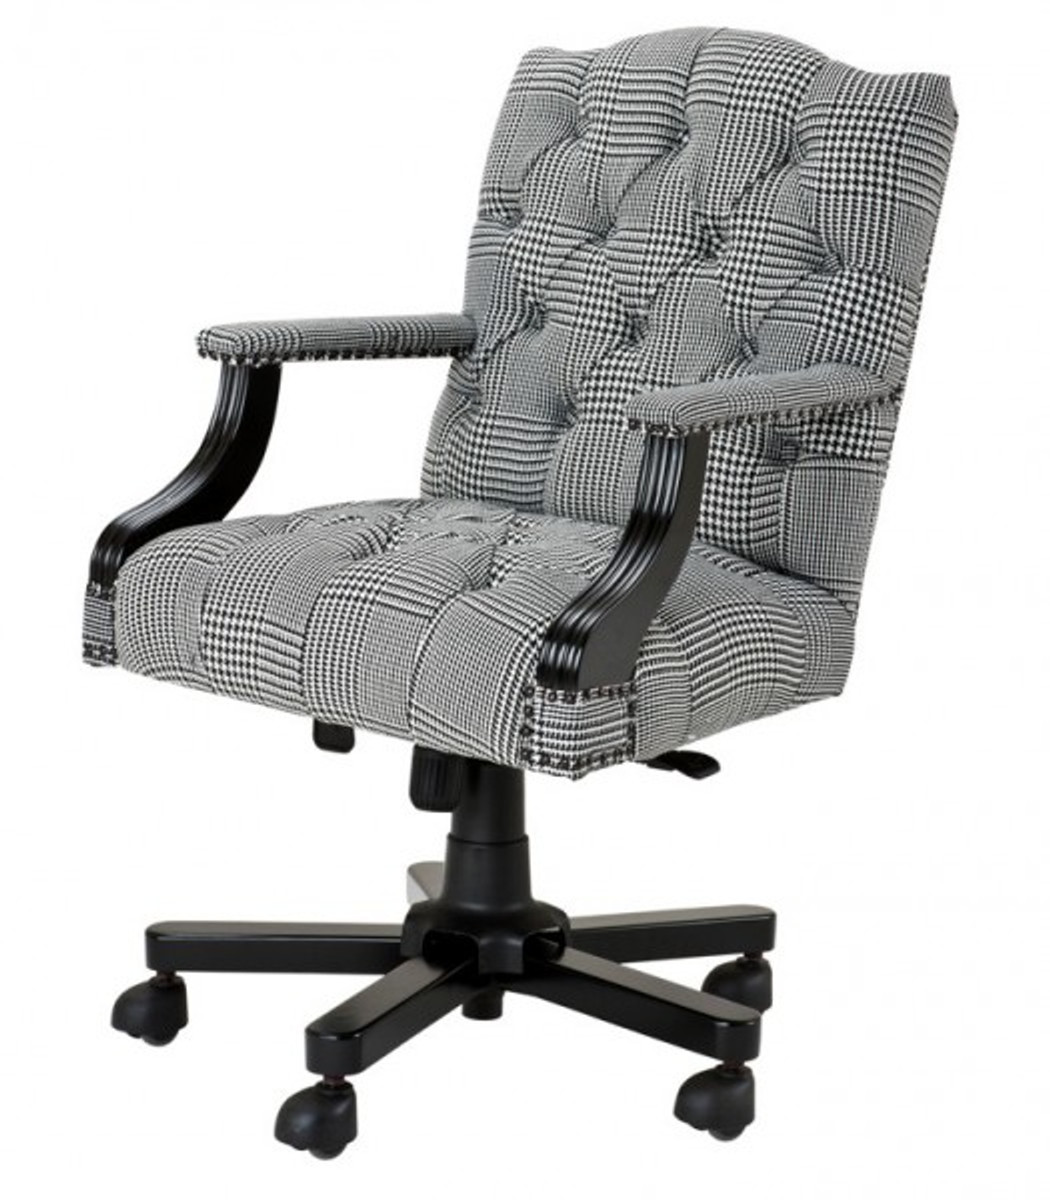 Luxury Executive Office Chair Black White Checkered Swivel Desk 1